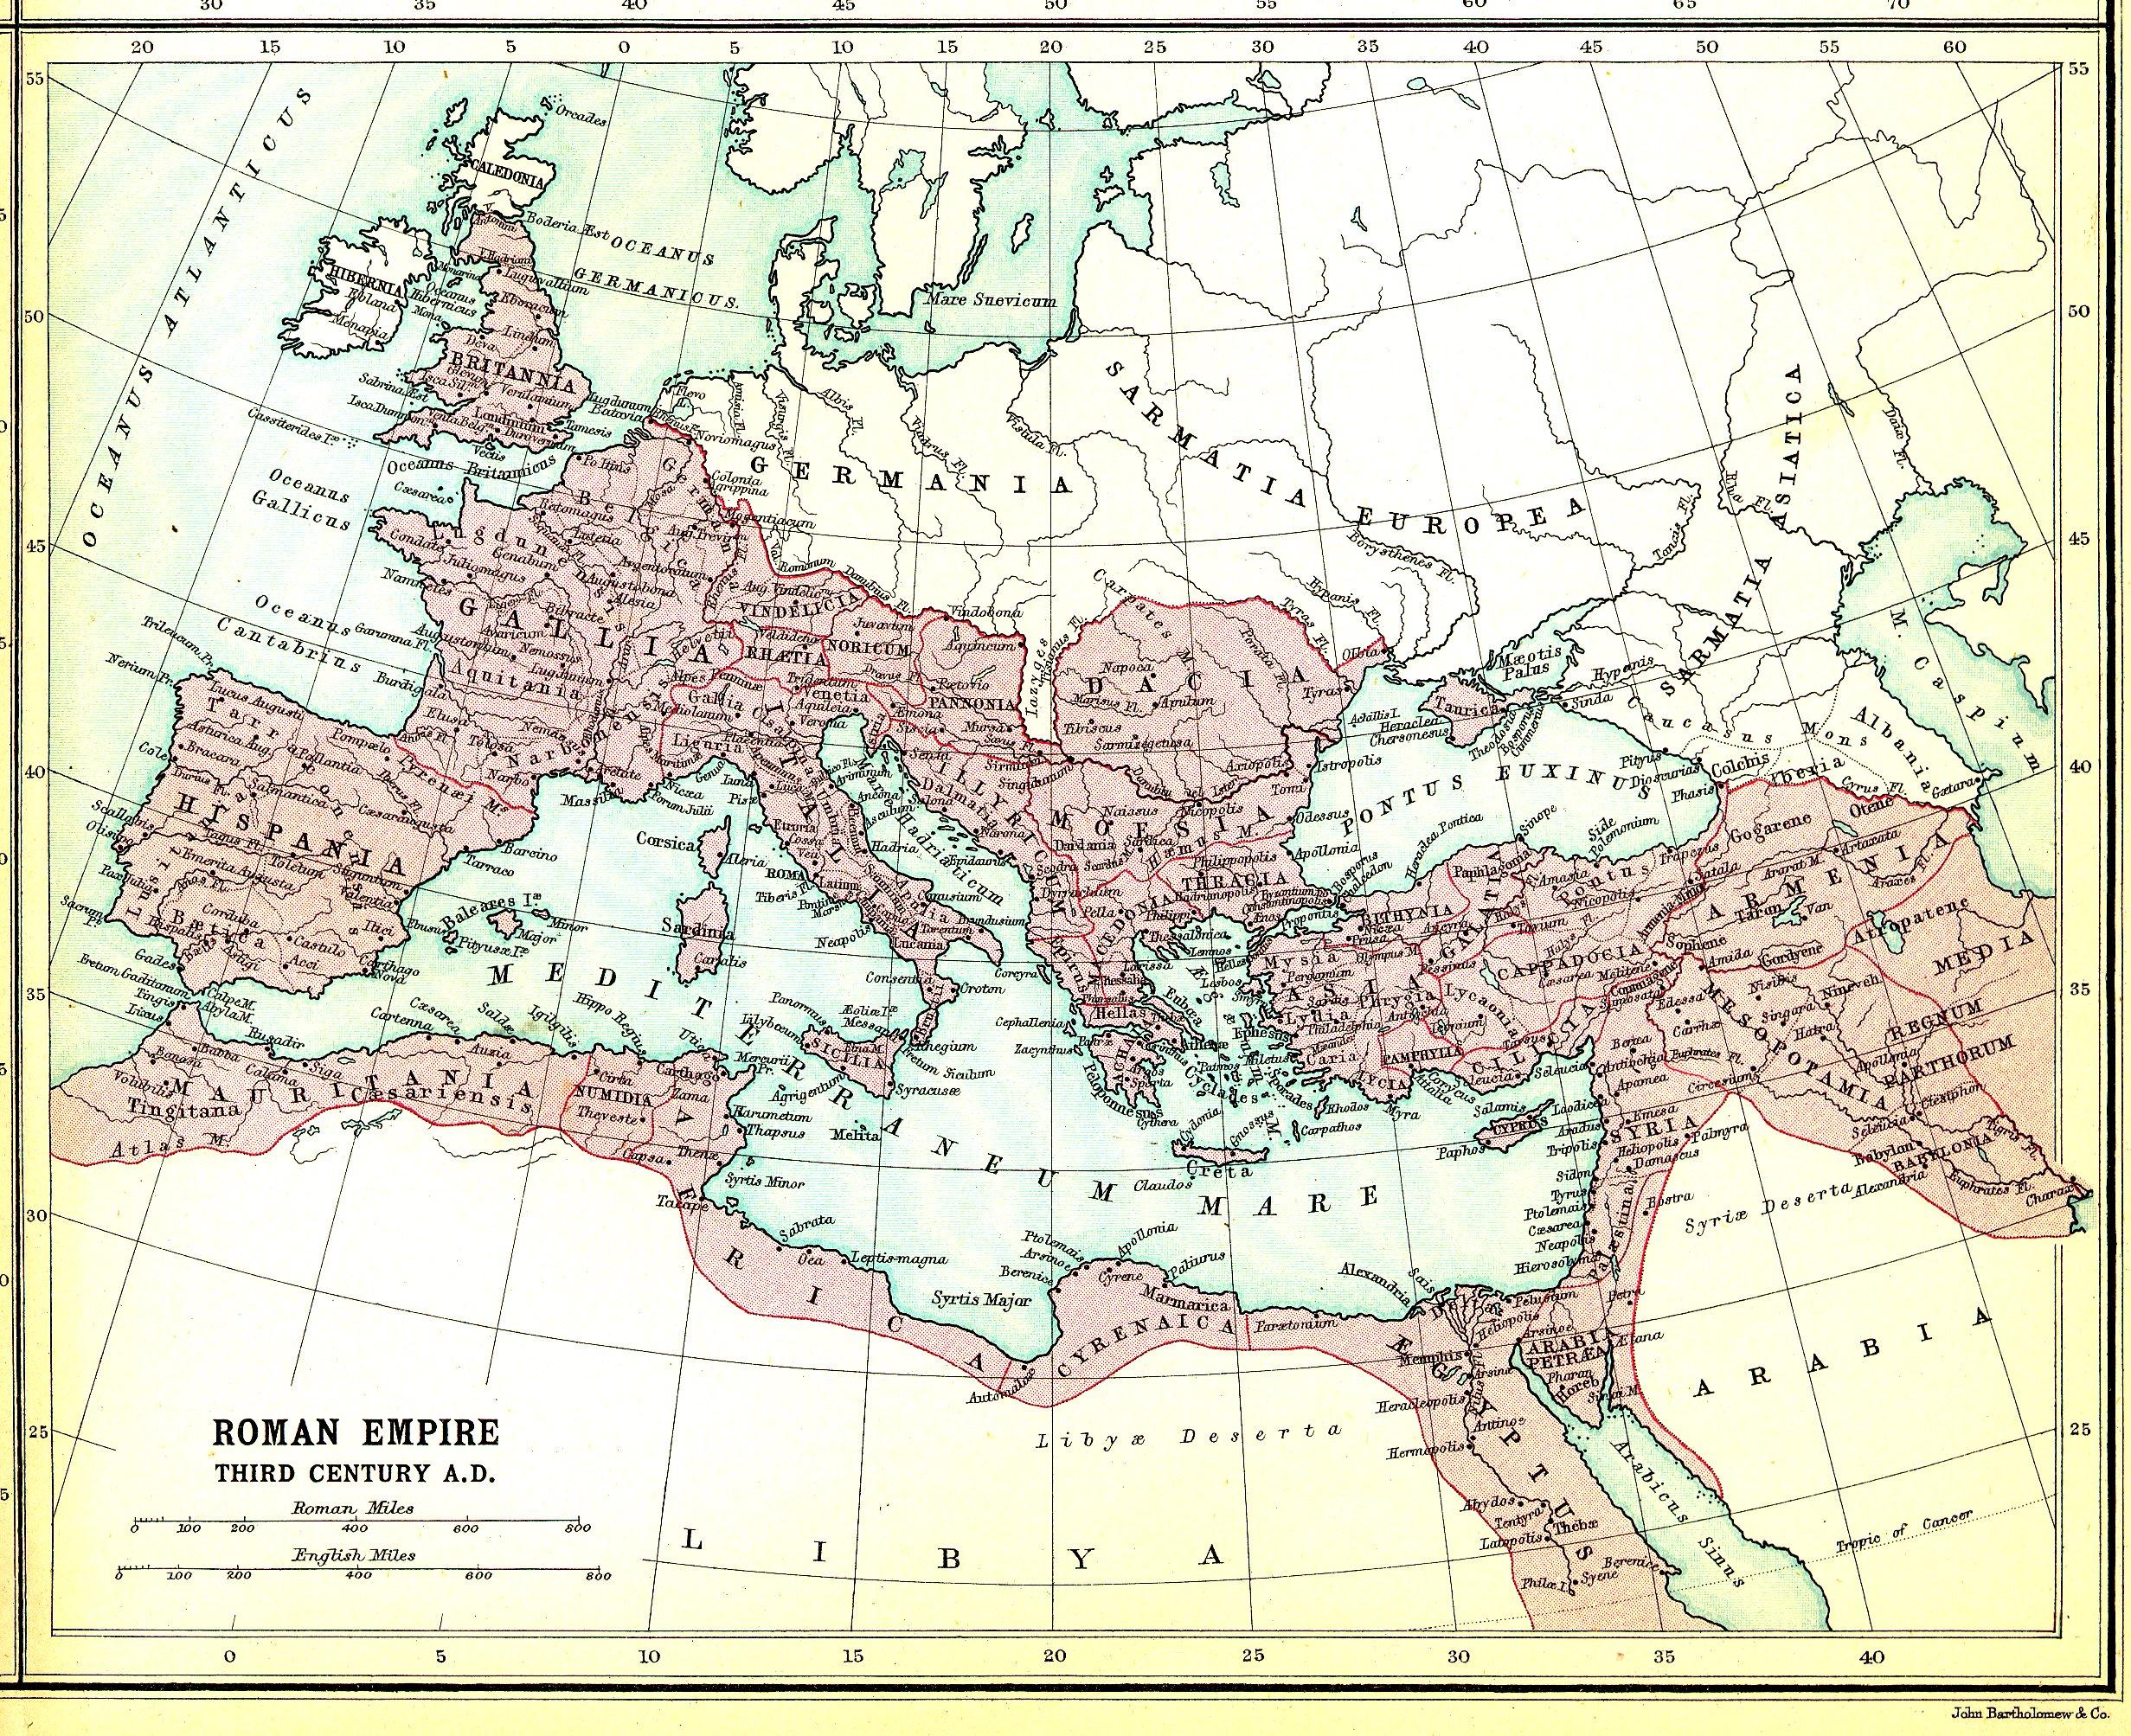 Roman_Empire_3rd century